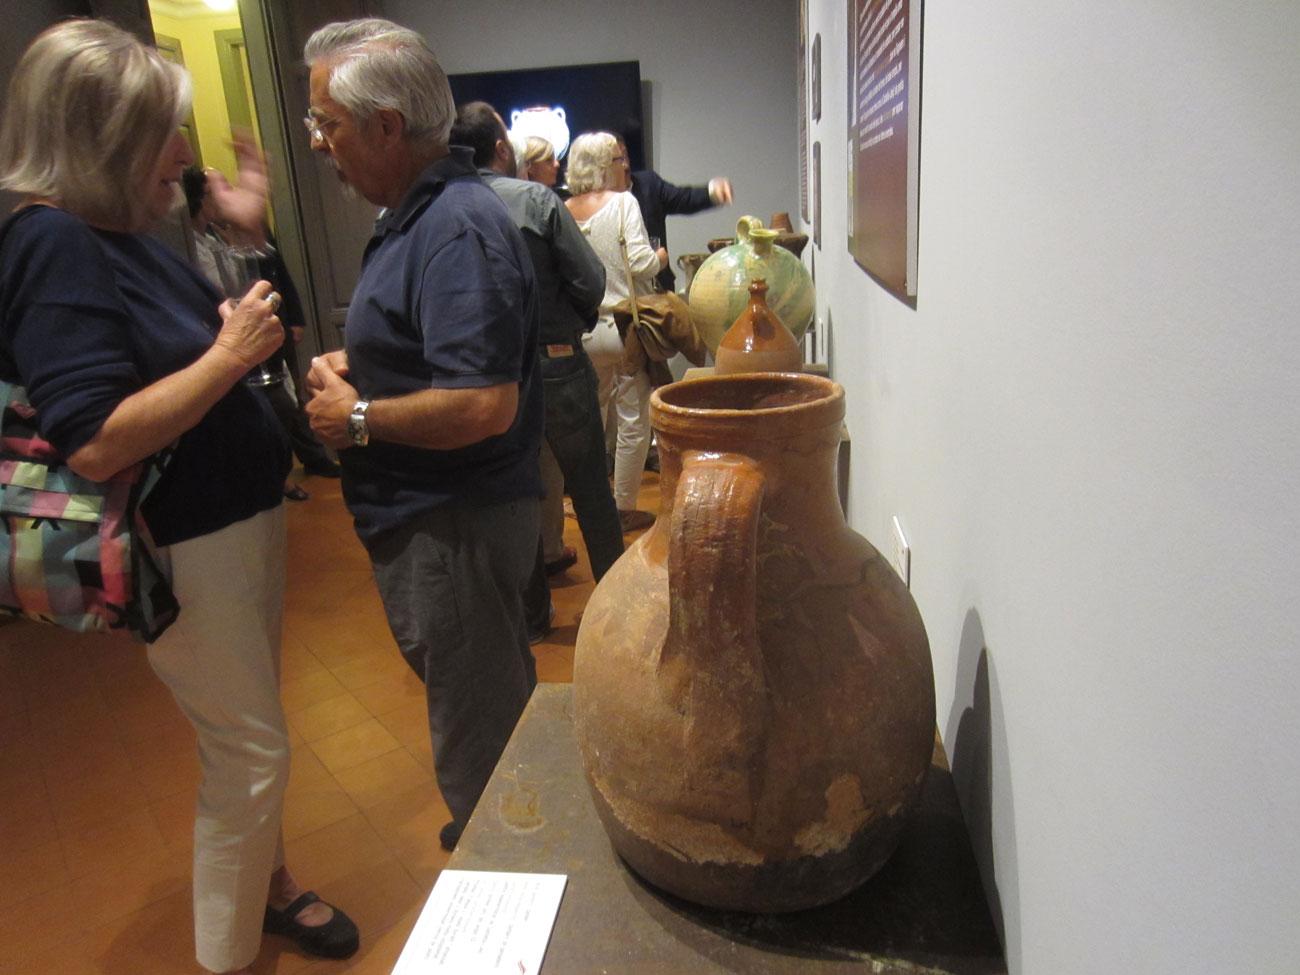 web-alfons-romero-casa-museu-cal-gerrer-fundacio-cabanas-78472